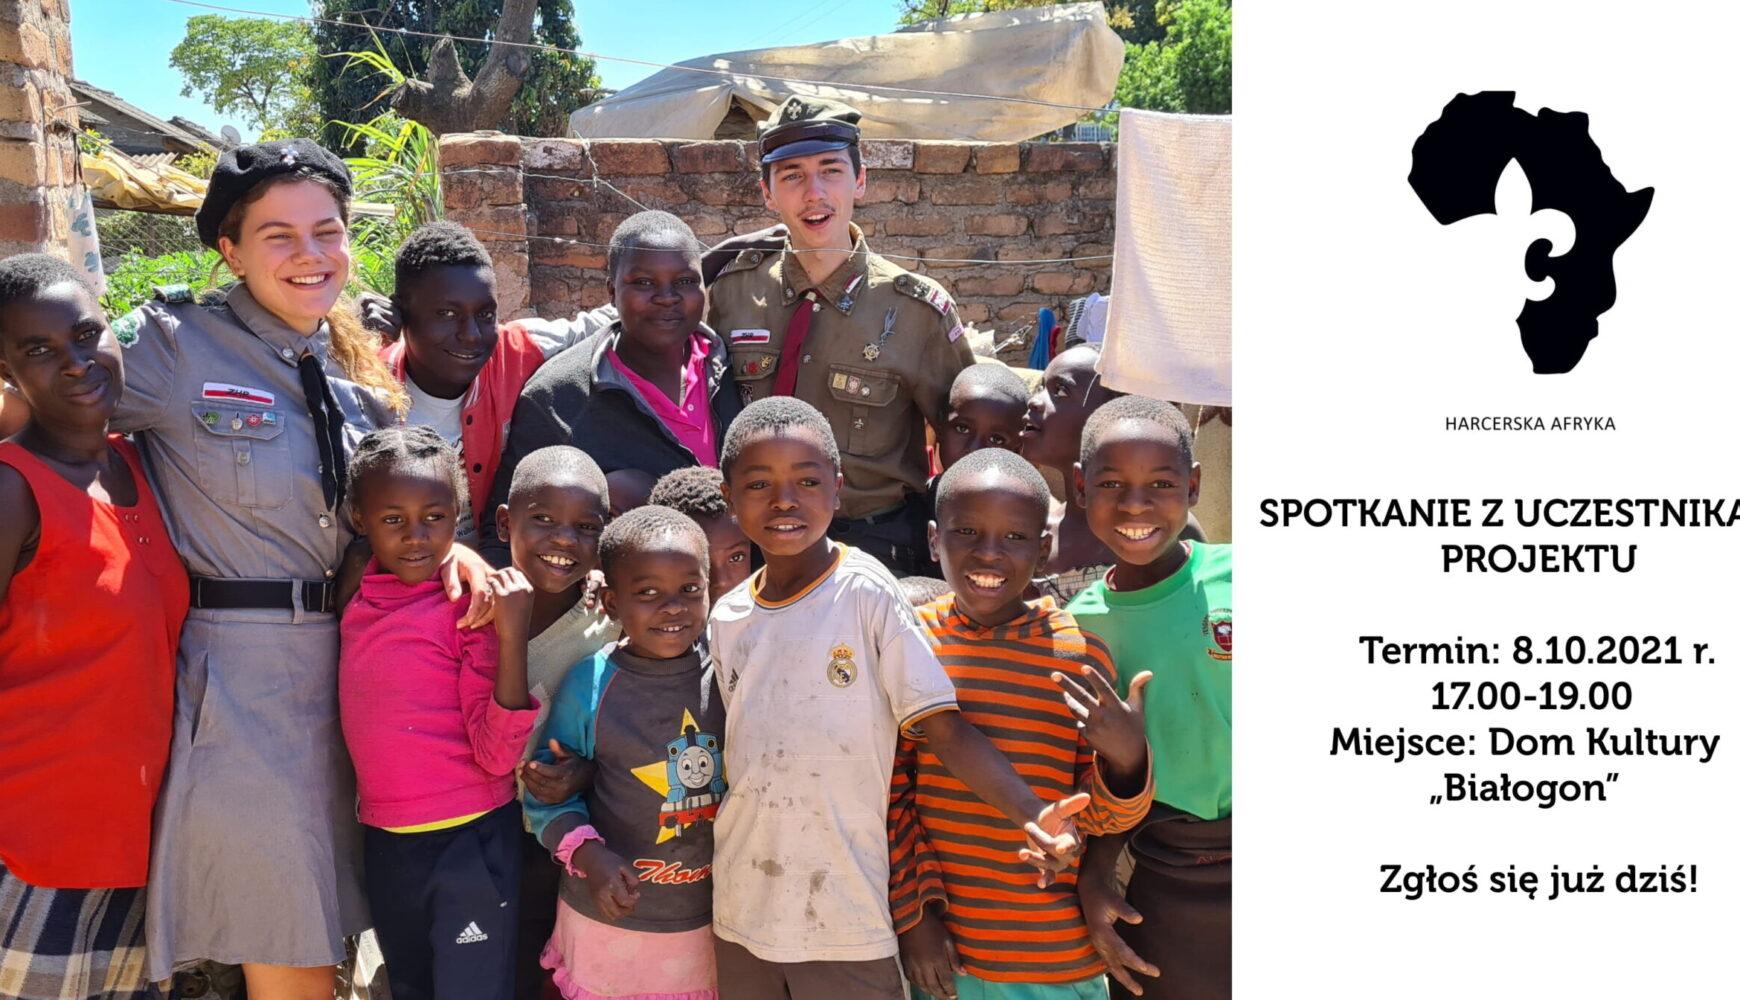 Spotkanie z uczestnikami projektu Harcerska Afryka